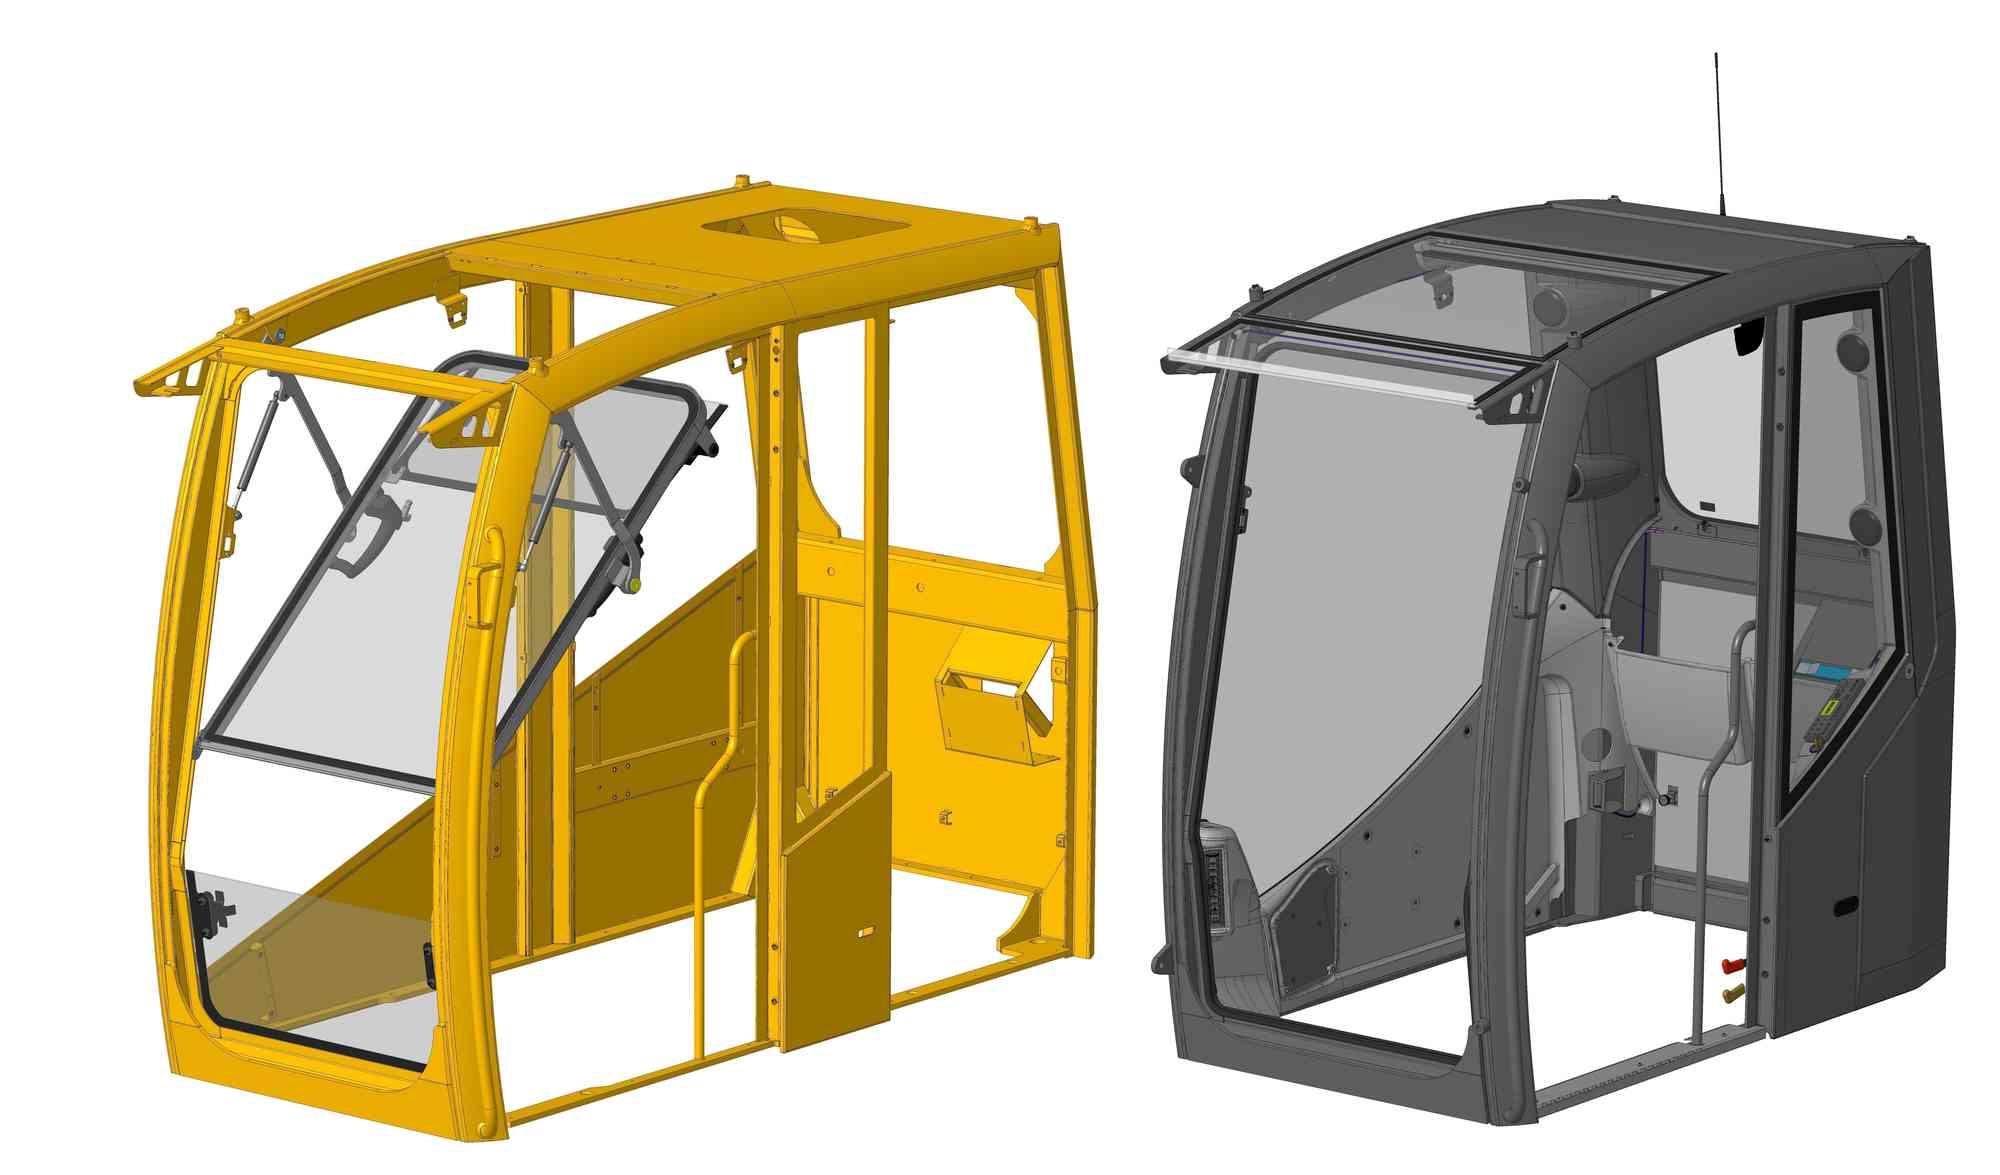 Cabine graafmachine visionengineering for 3d interieur ontwerp